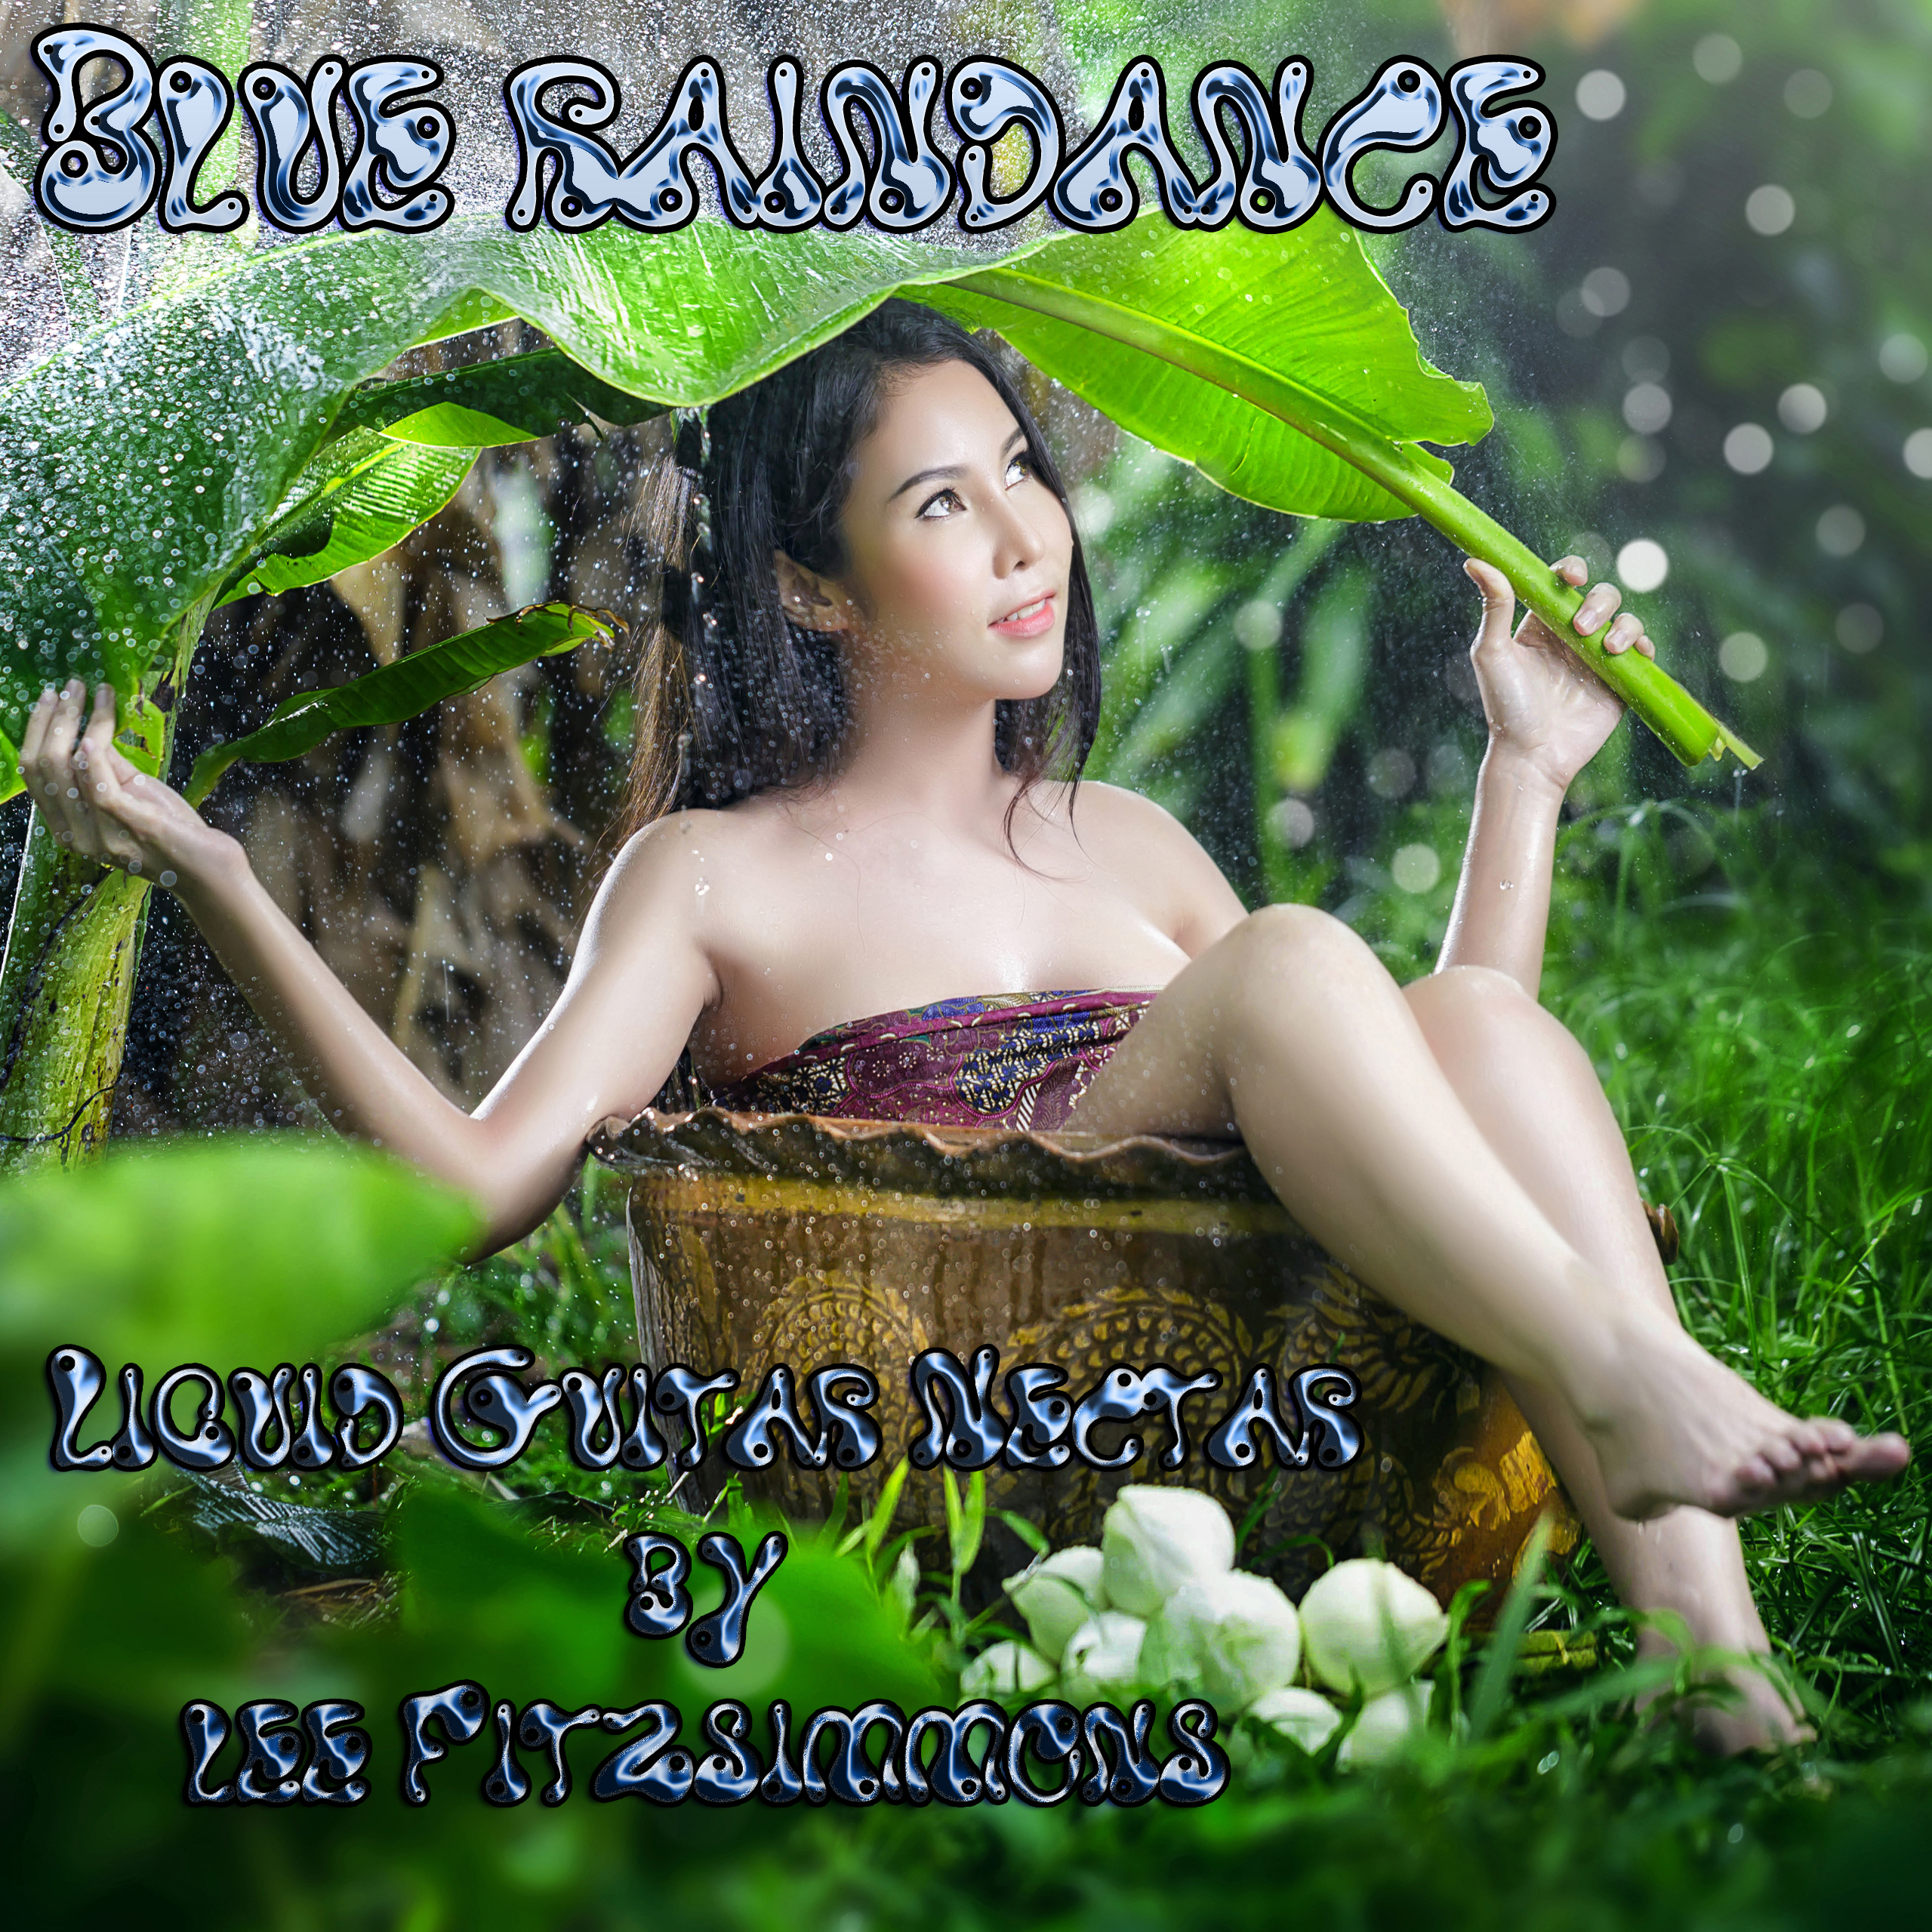 Blue Raindance